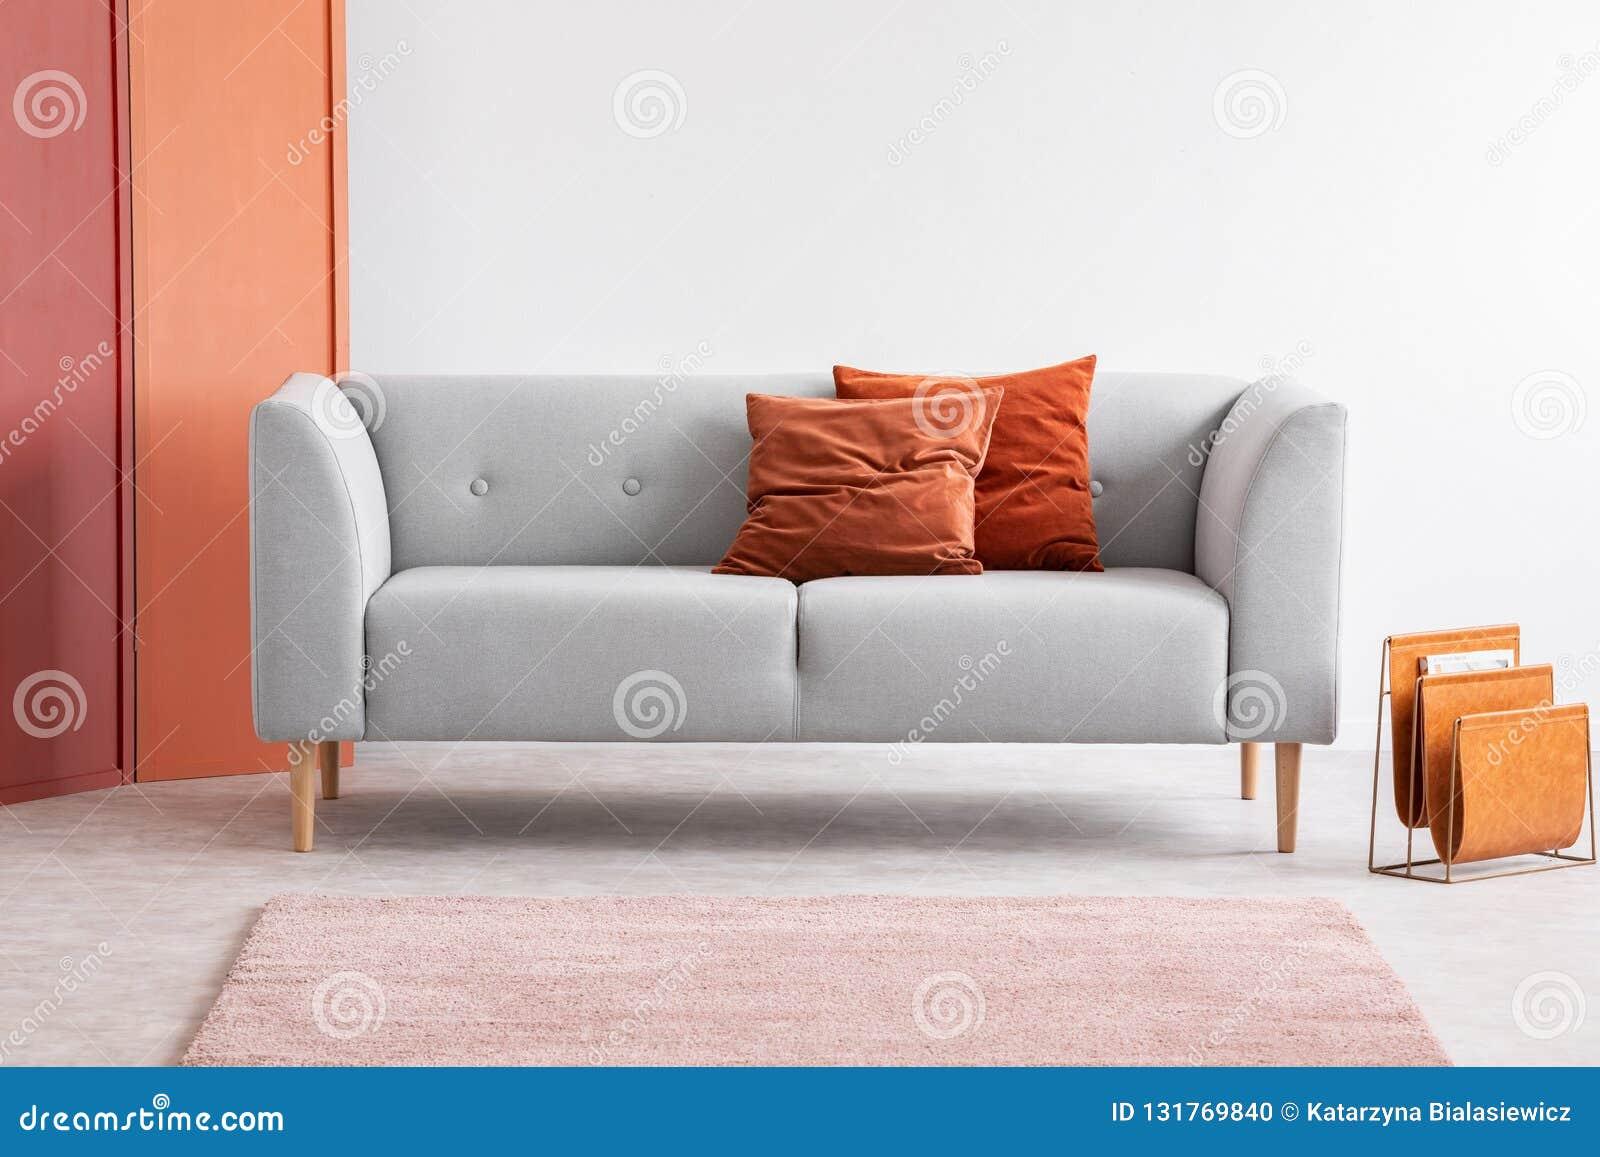 Orange Pillows On Grey Sofa In Grey Living Room Interior ...